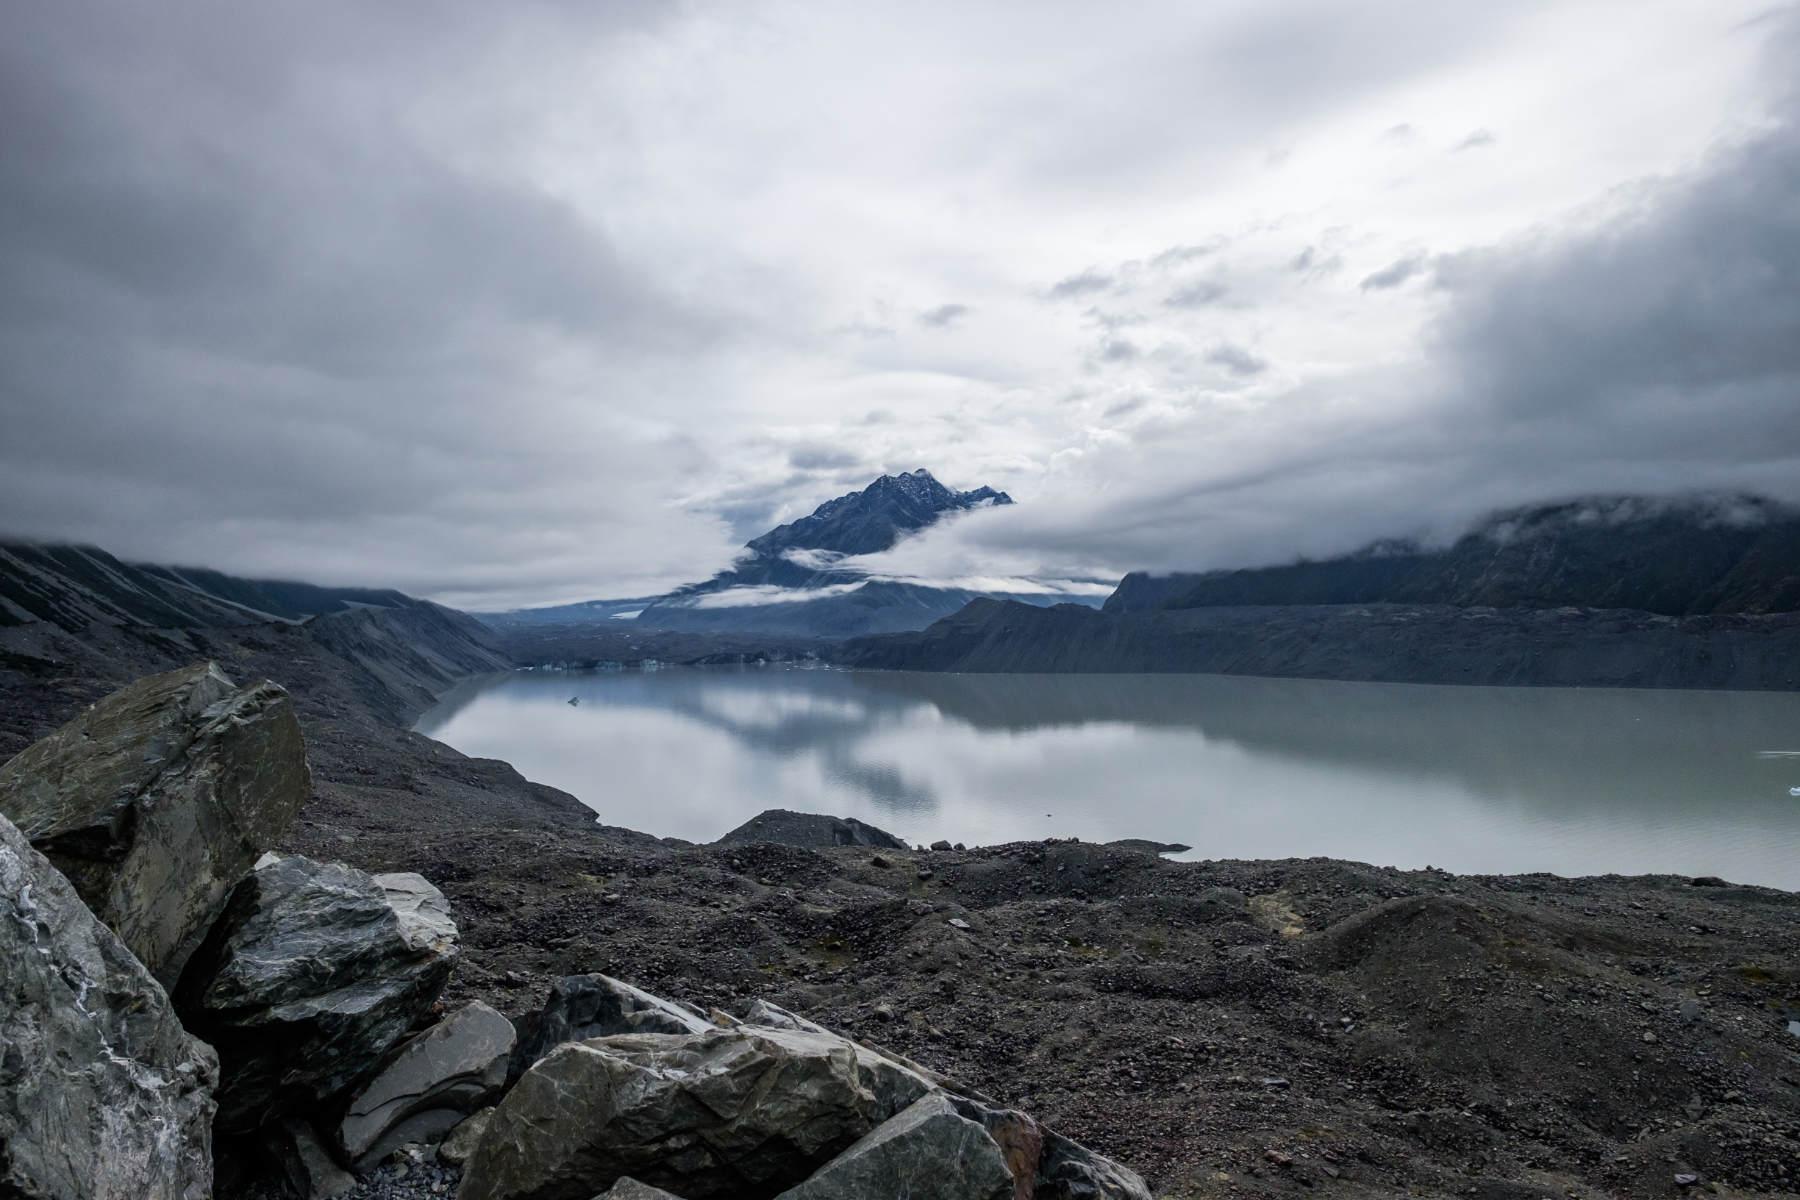 Mount cook from Tasman Valley glacier park New Zealand